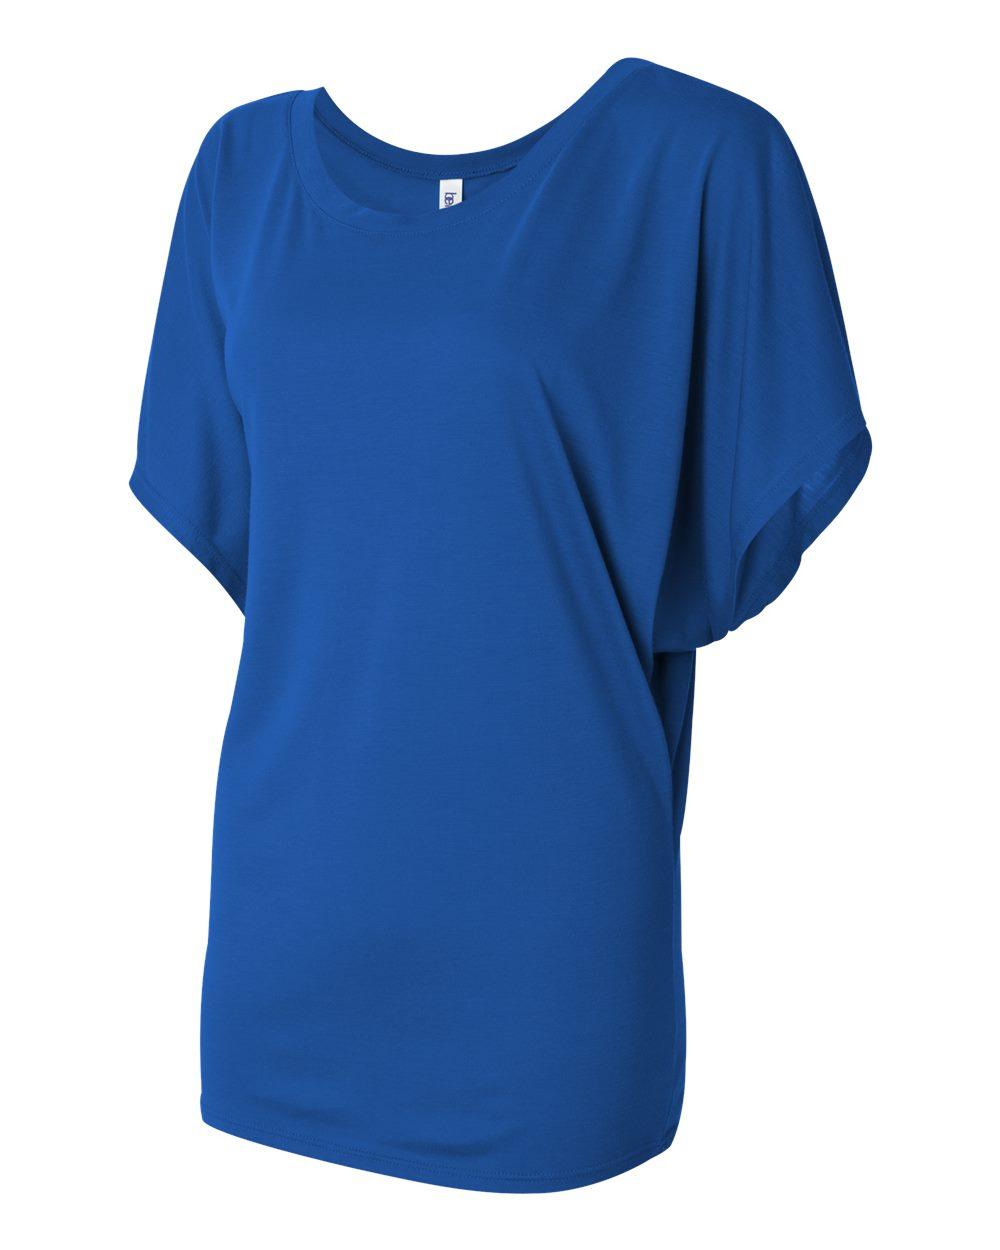 Bella-Canvas-Women-039-s-Flowy-Draped-Sleeve-Dolman-T-Shirt-8821-S-2XL thumbnail 36